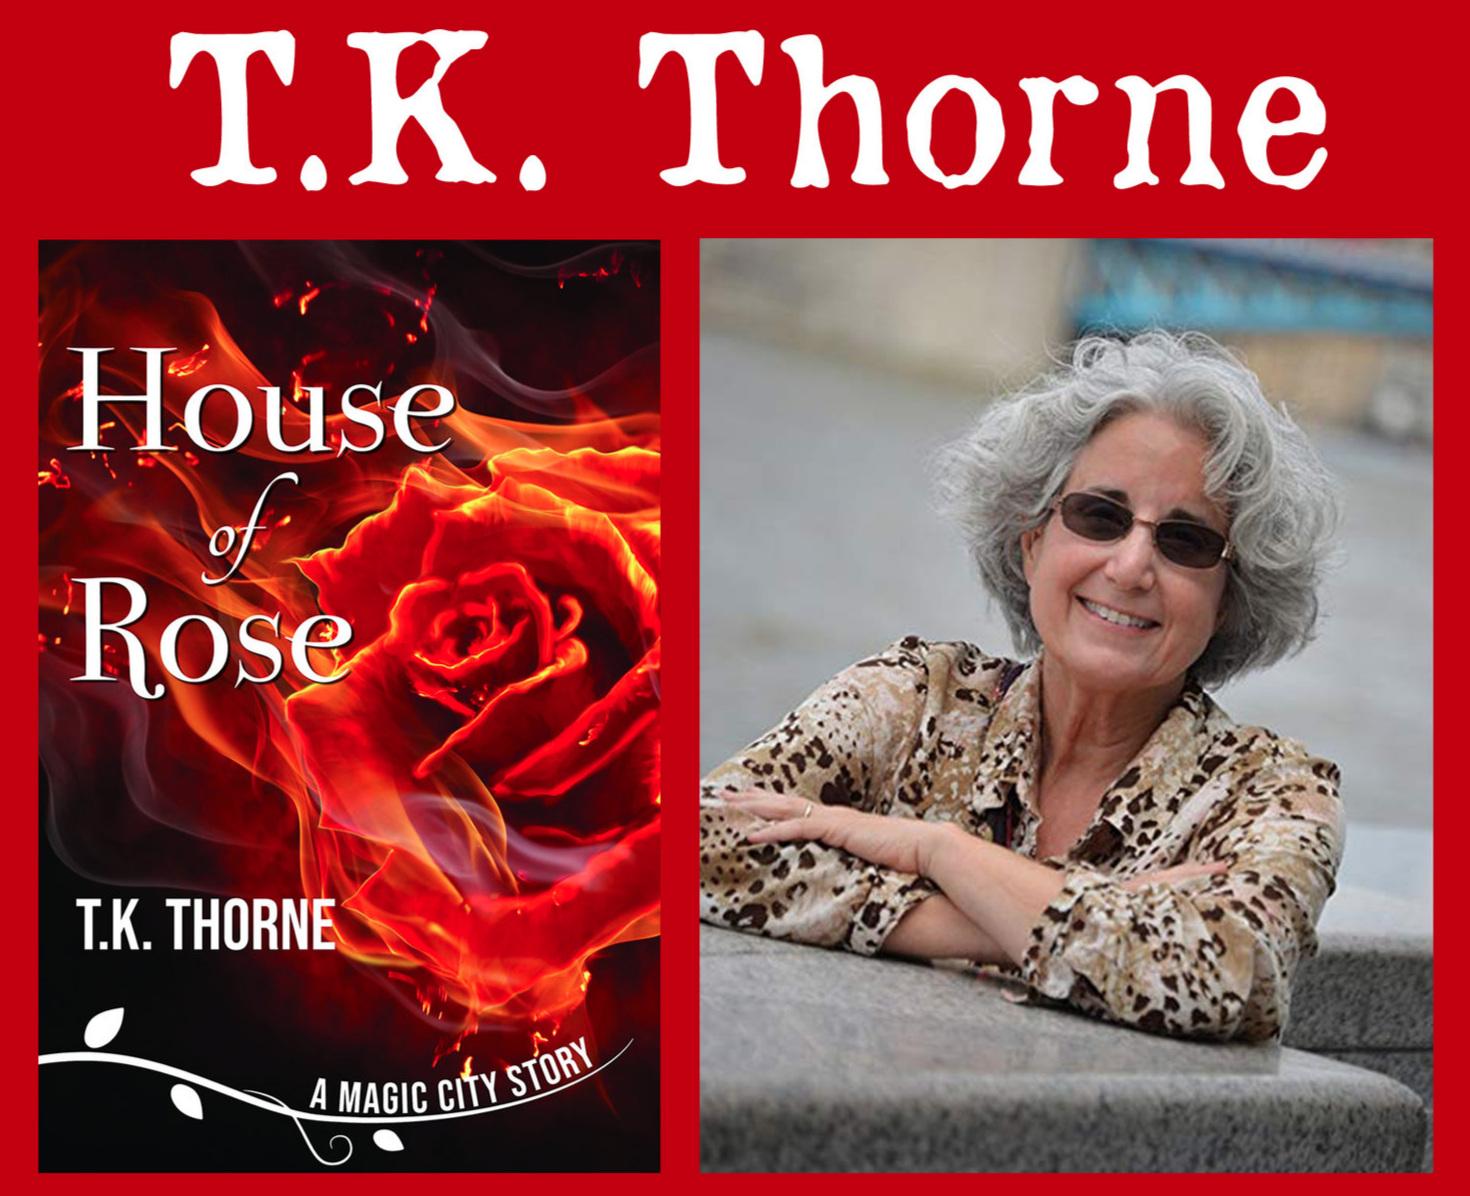 tk+thorne.jpg